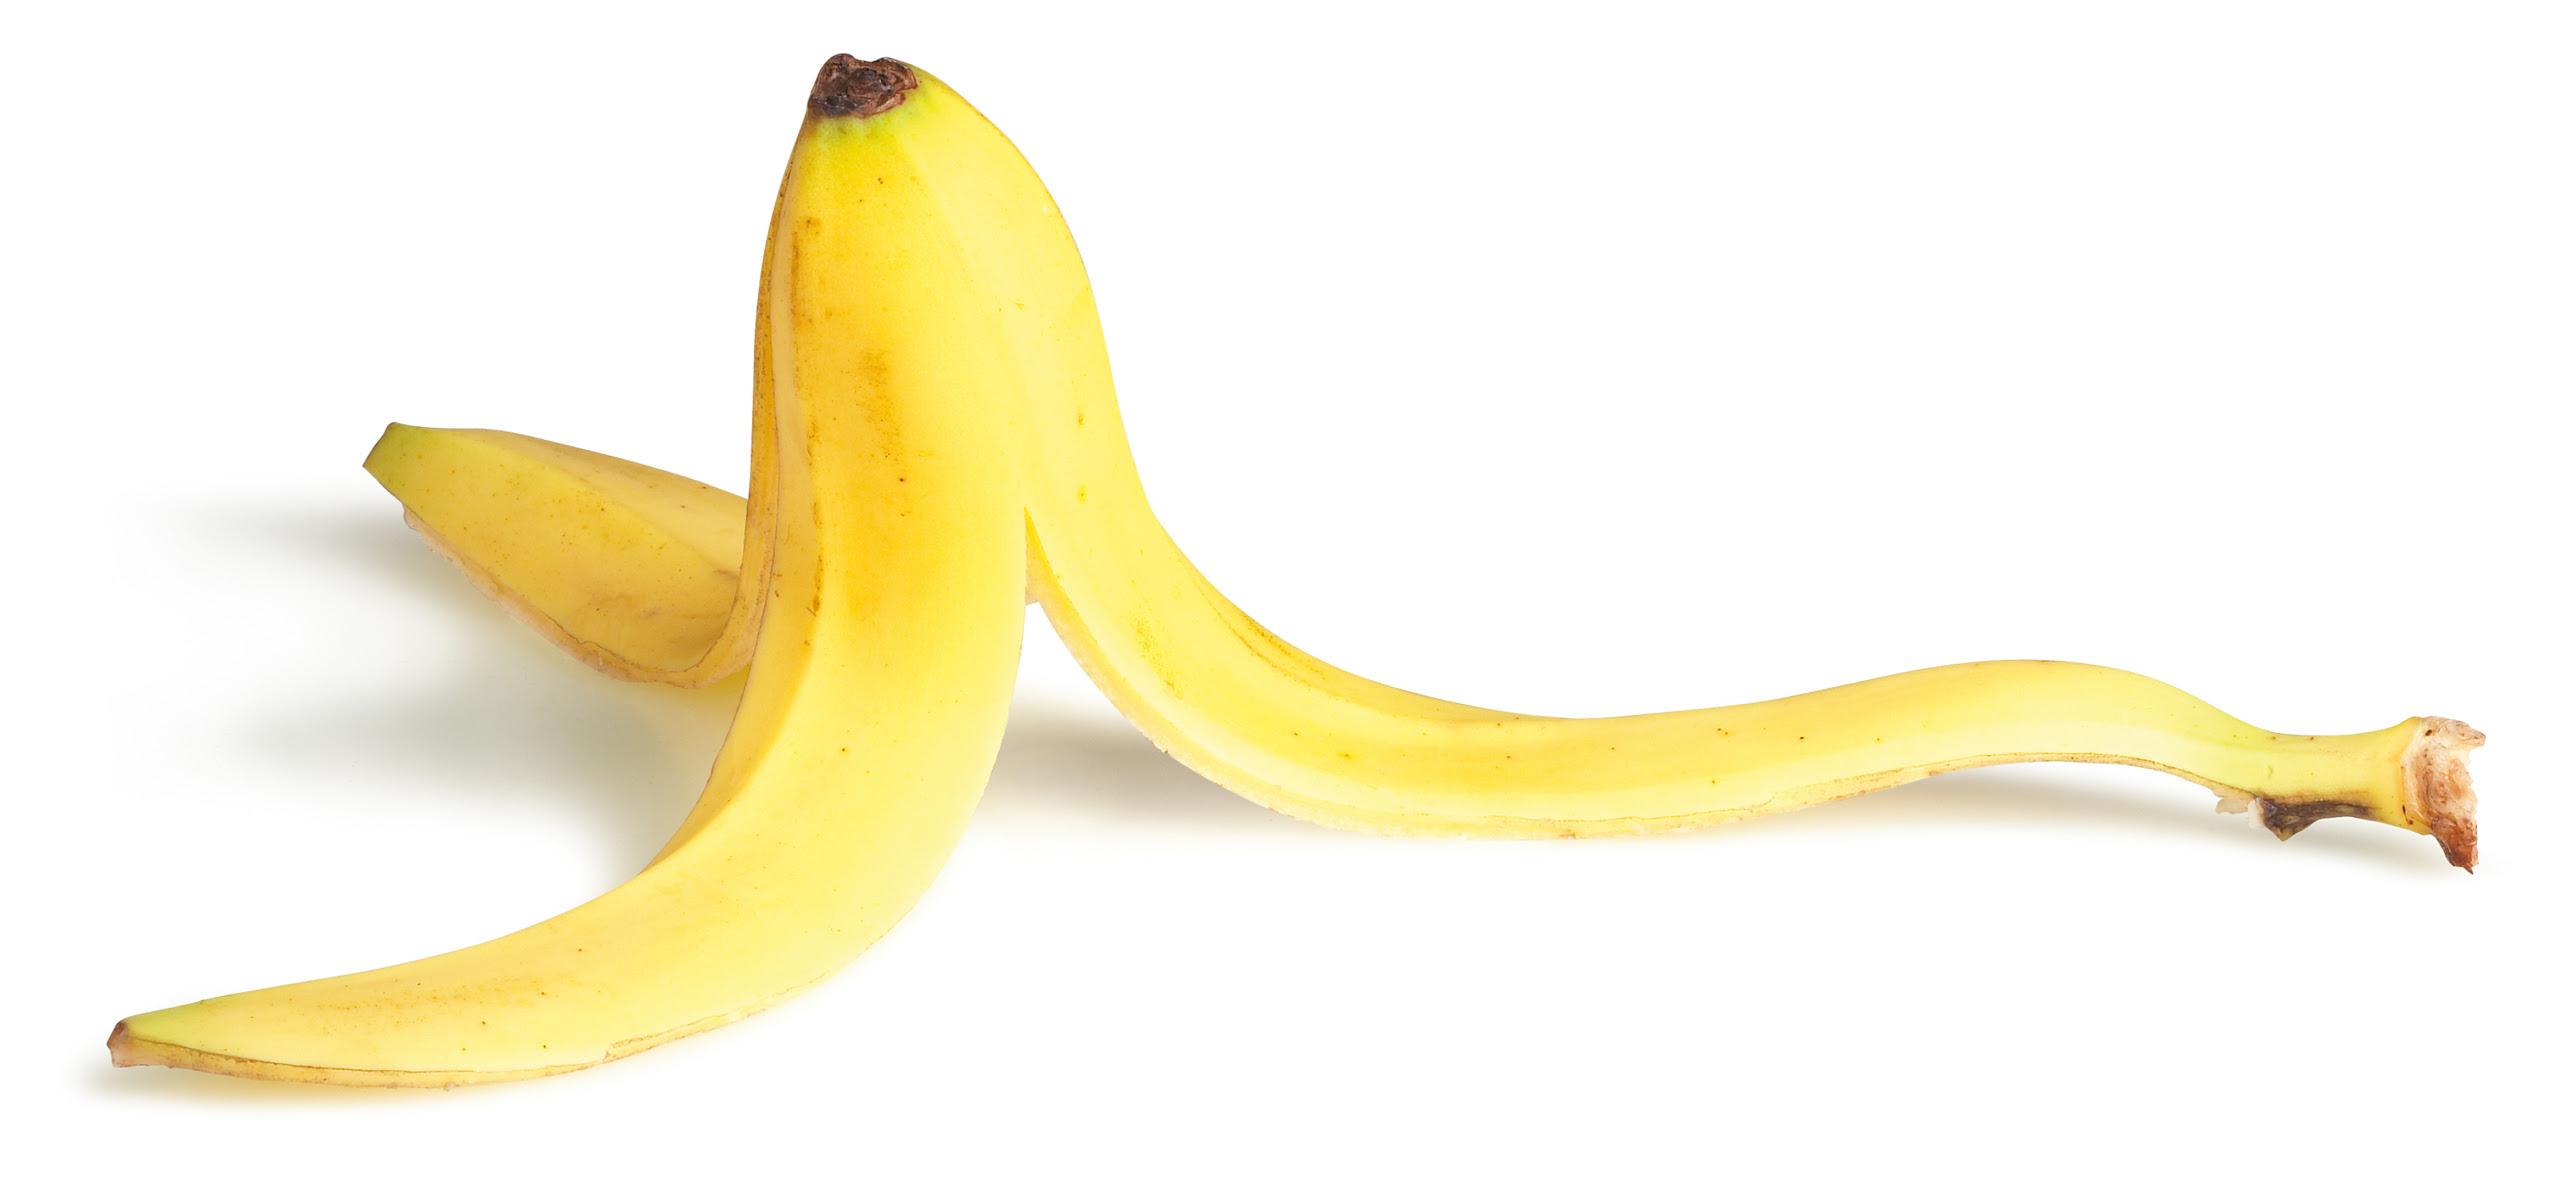 Image result for banana peel